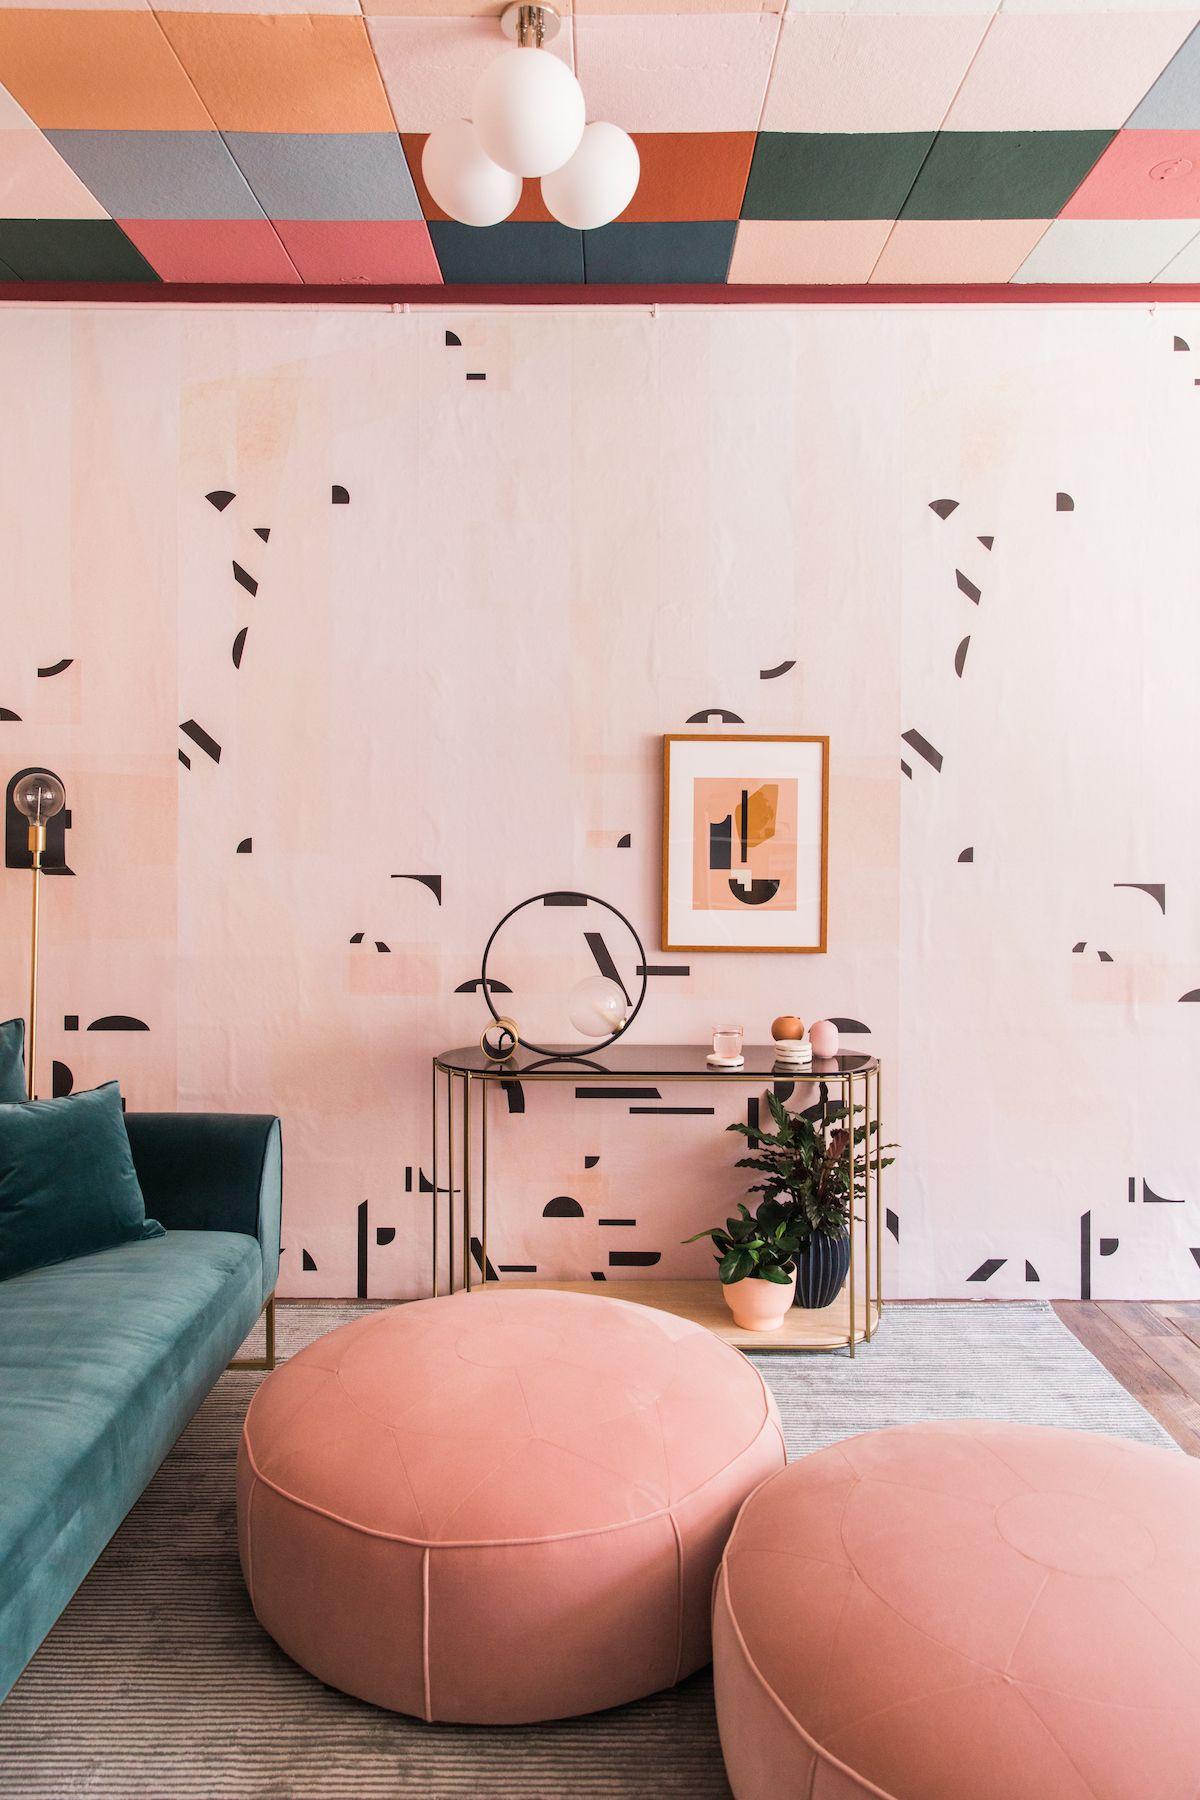 In Pasadena, an Art Deco Dream with a Vibrant Checkered